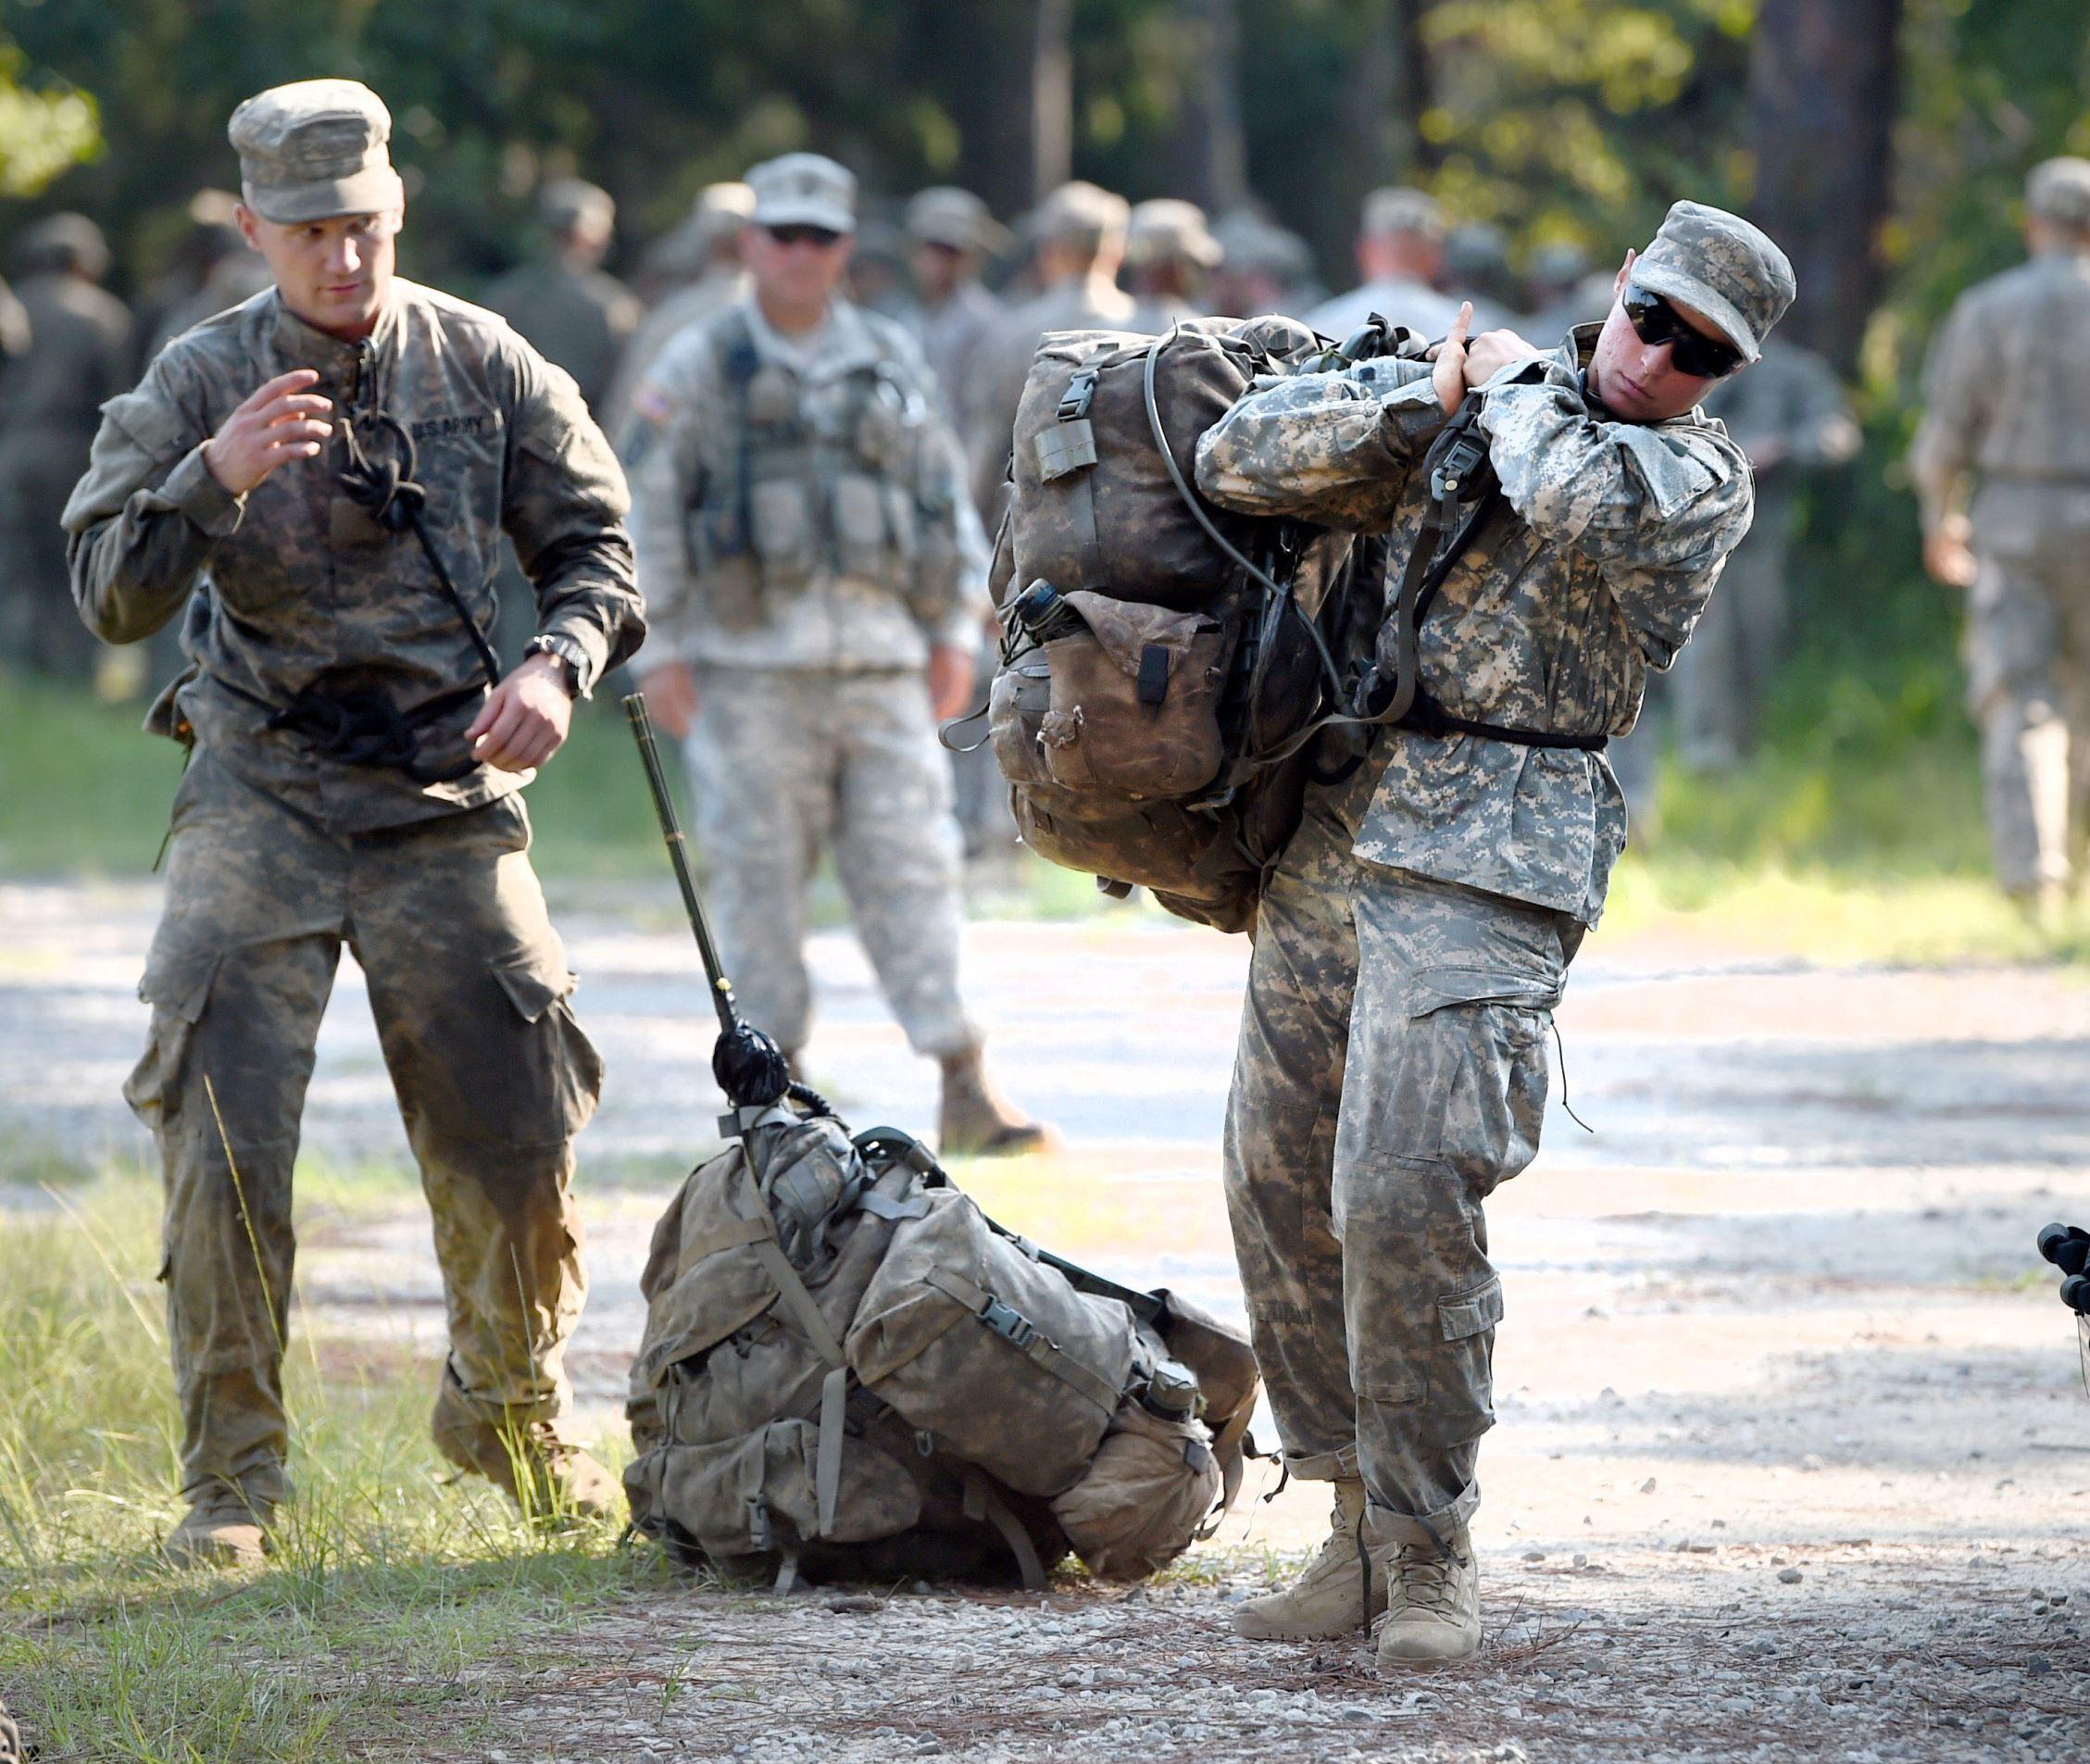 Female Army Rangers Nick Tomecek/Northwest Florida Daily